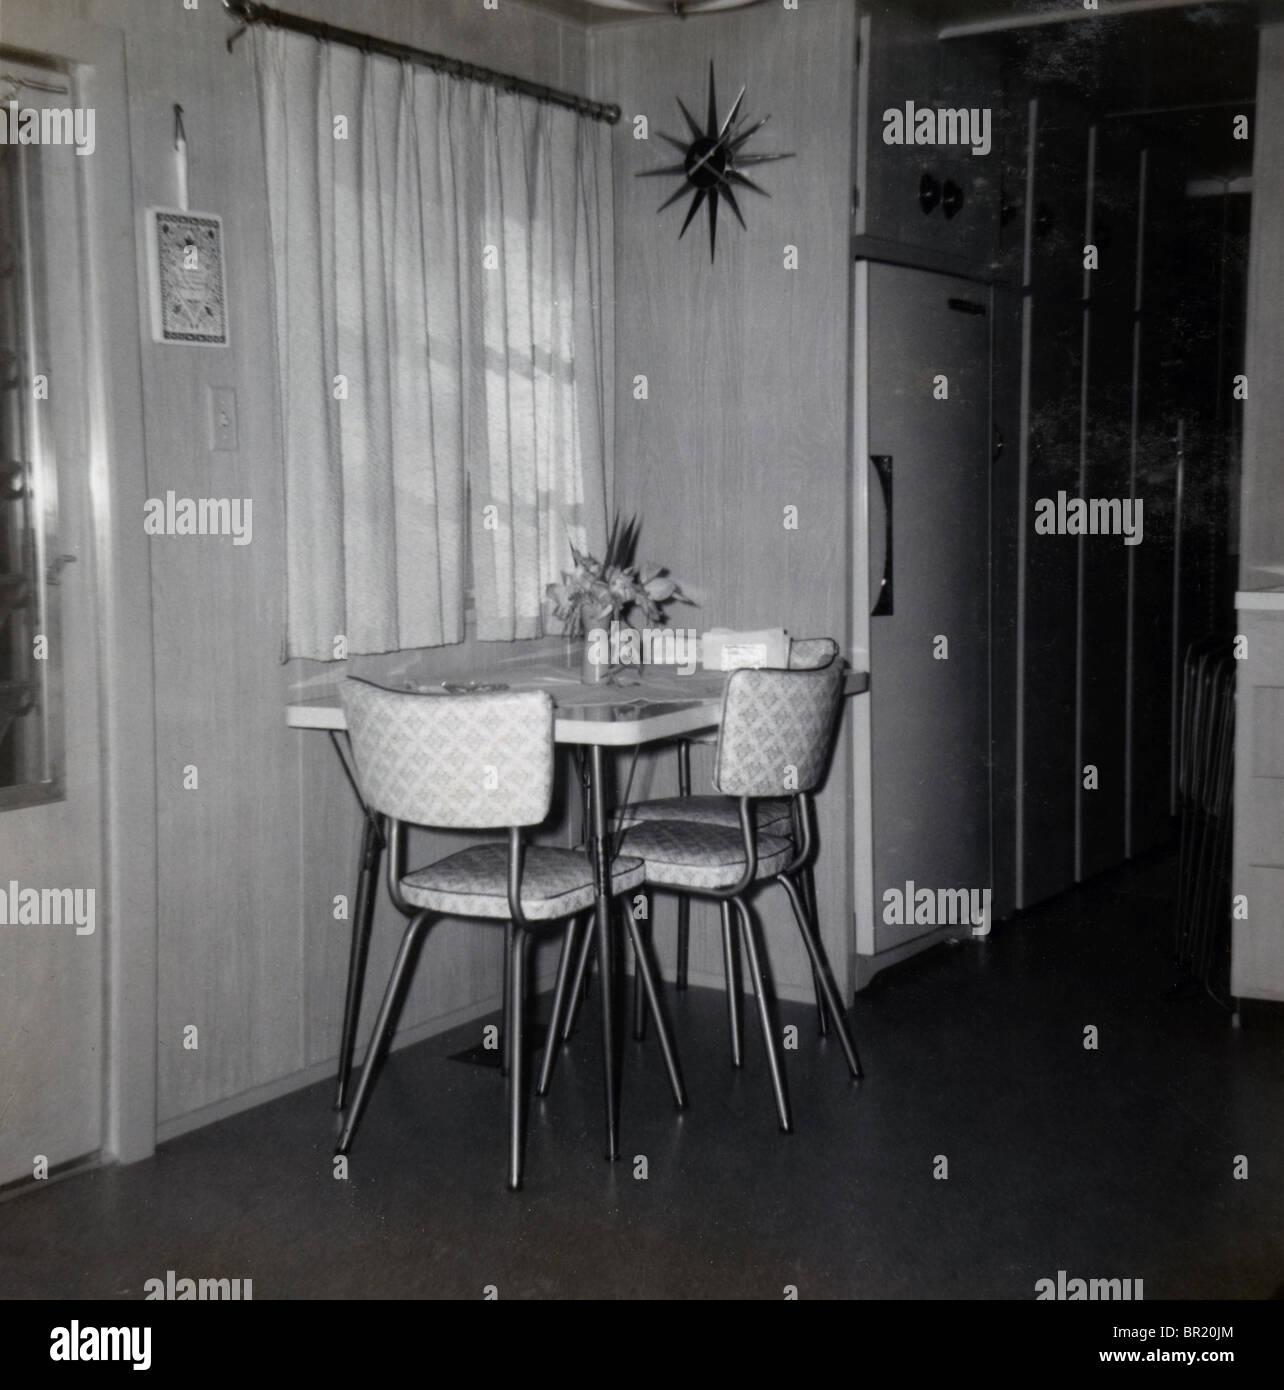 Retro Mod Circa 1964 Kitchenette Dining Area Daytona Beach Florida